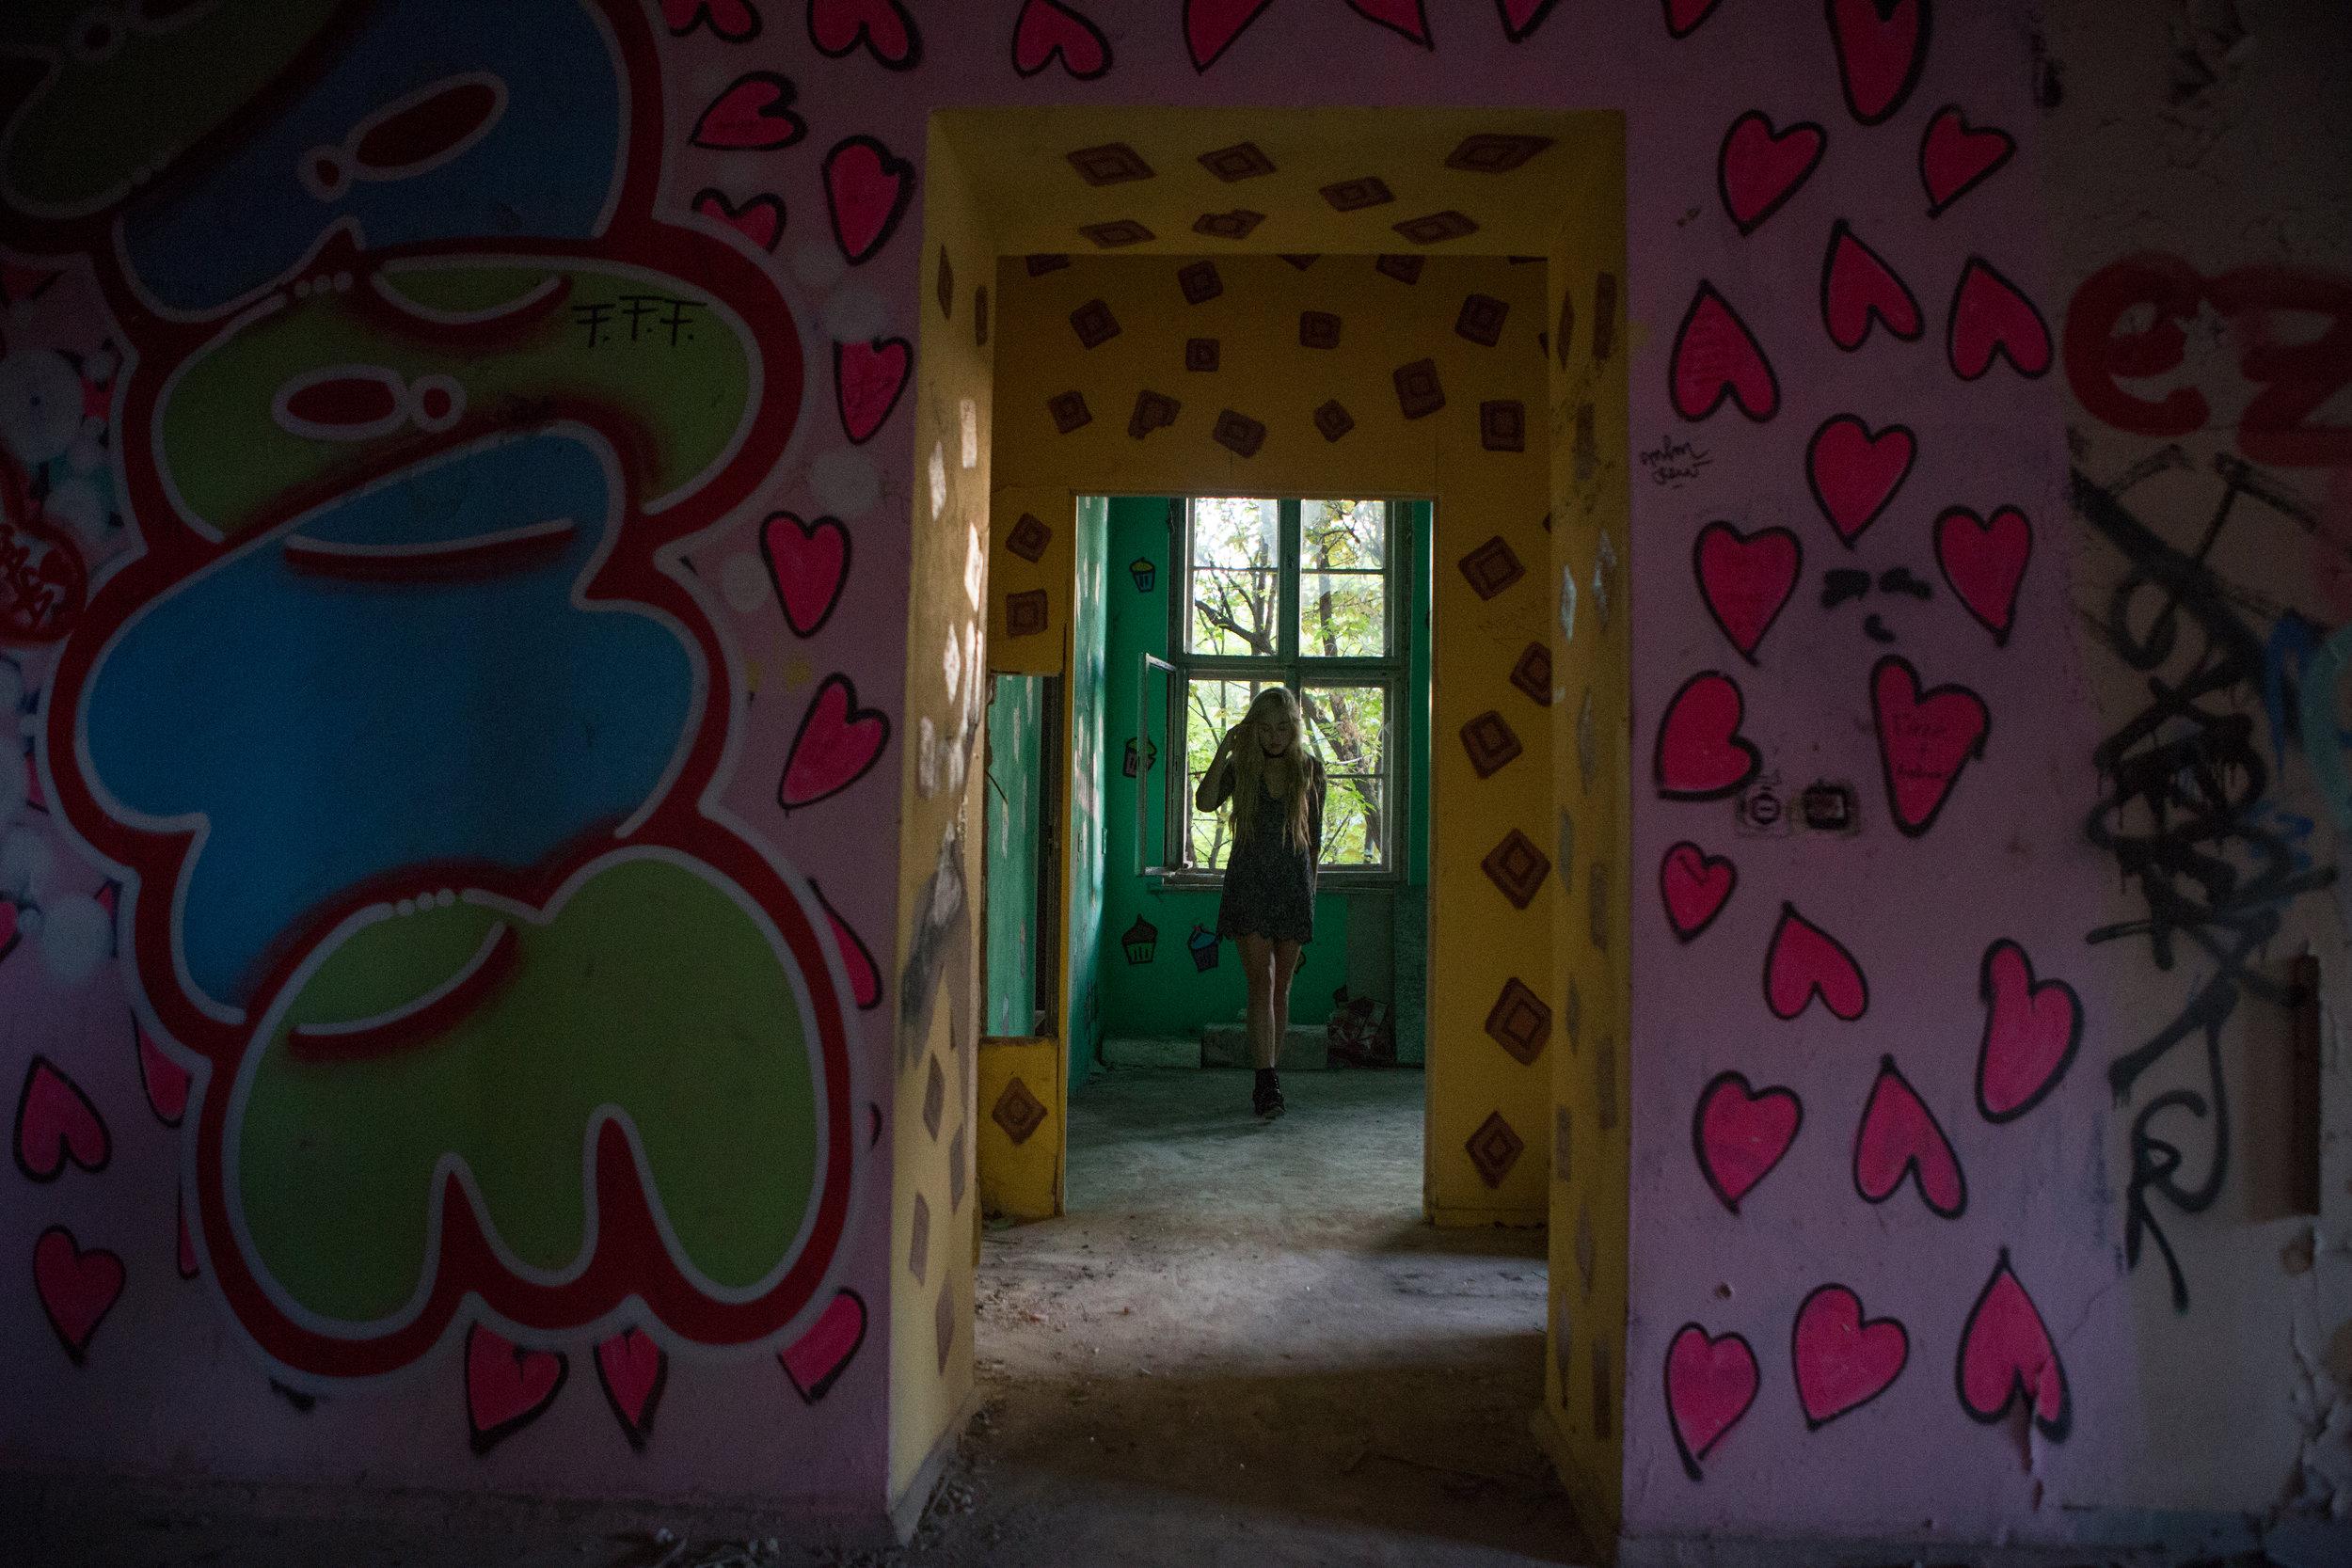 AstroBandit_Berlin_Abandoned_Childrens_Hospital_Zombie_Weissensee_ForLoveandLemons_11.jpg